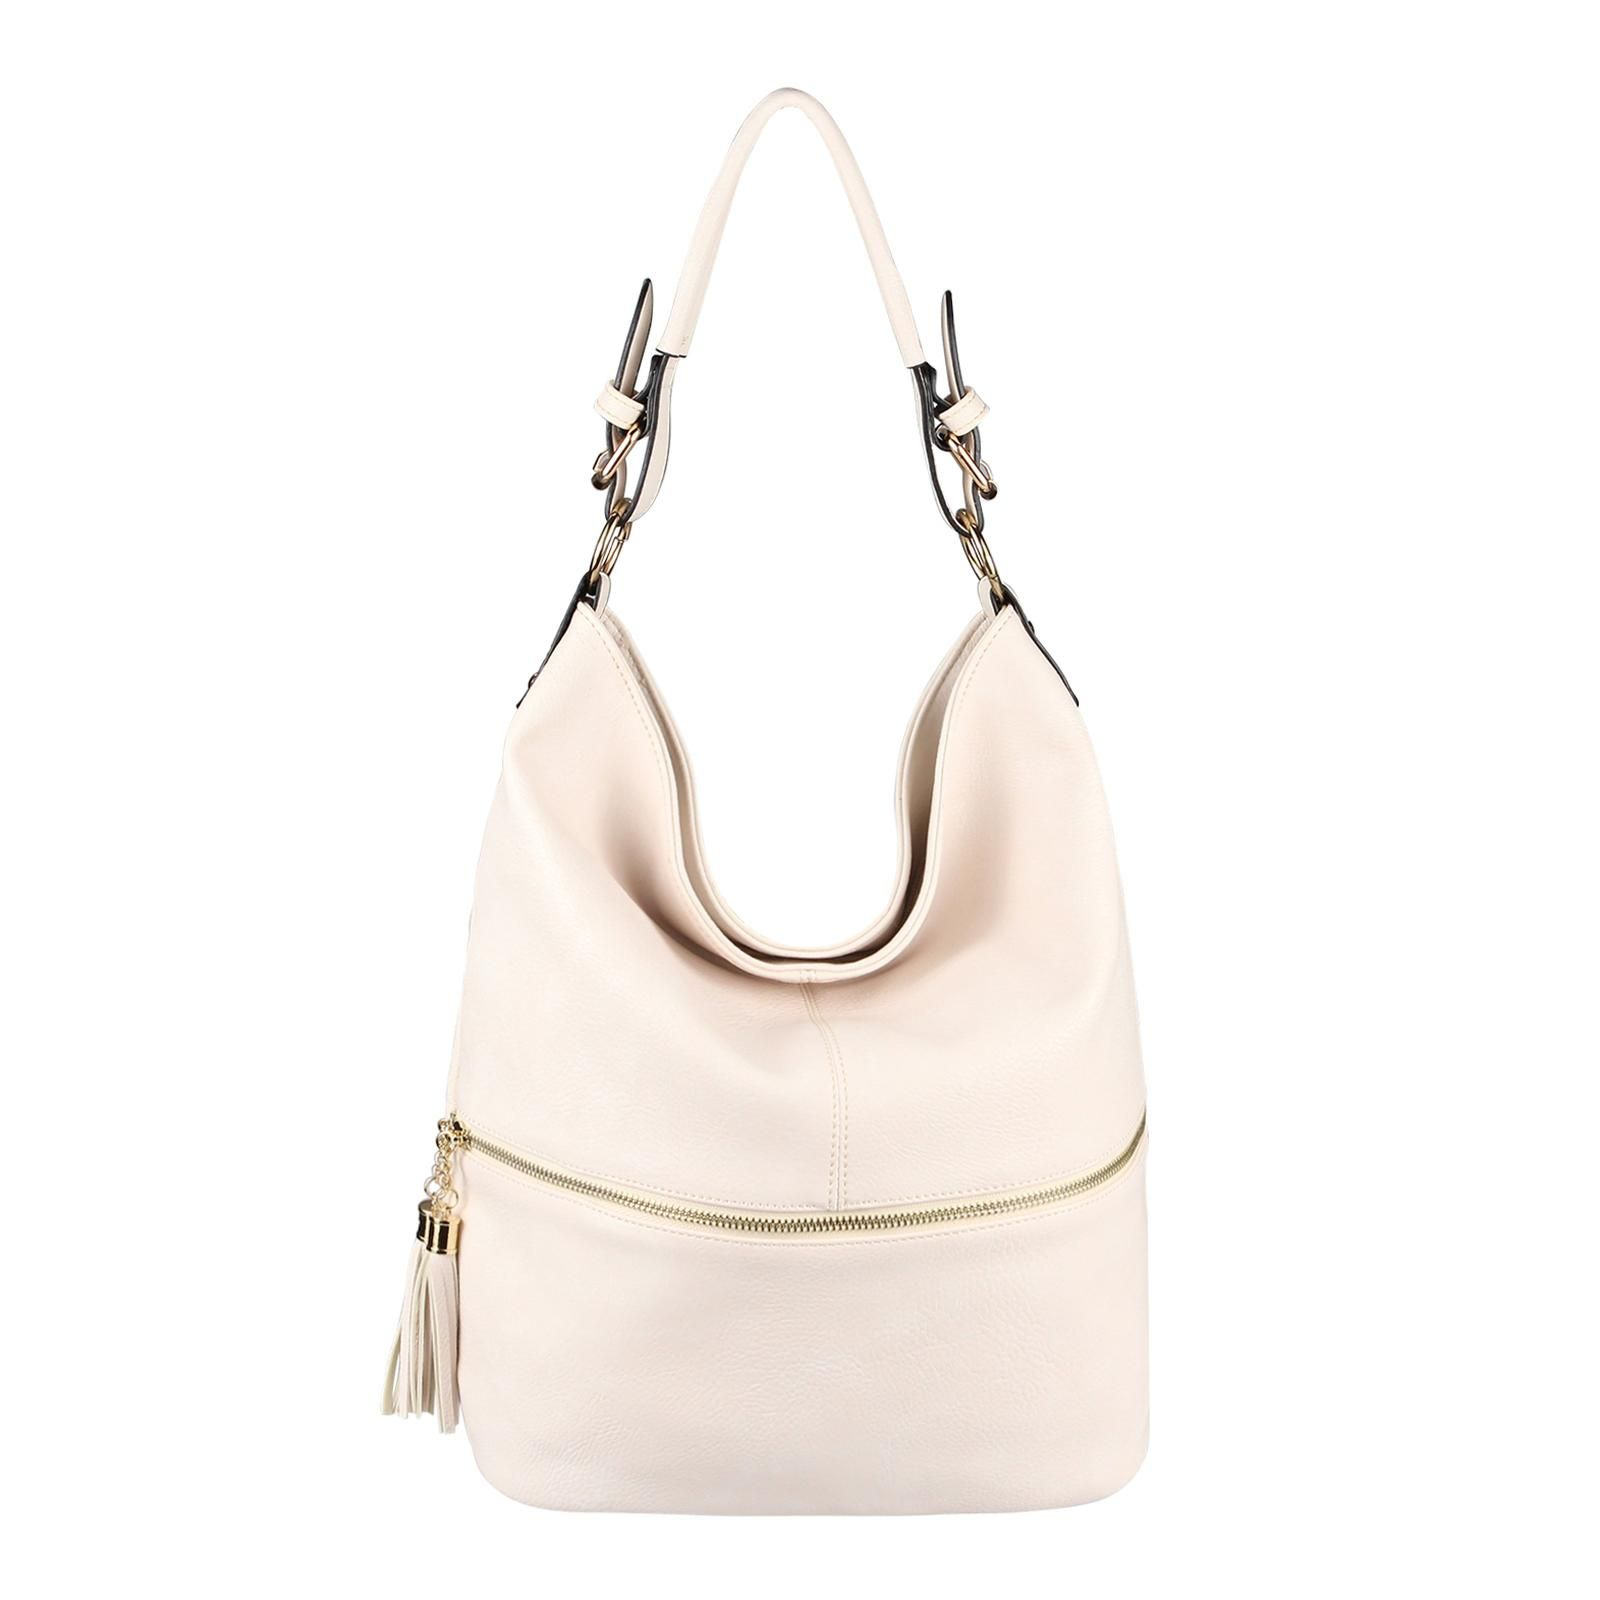 d191493743543 Damen Tasche Shopper Schultertasche Umhängetasche Handtasche Hobo-Bag  Beuteltasche Beige